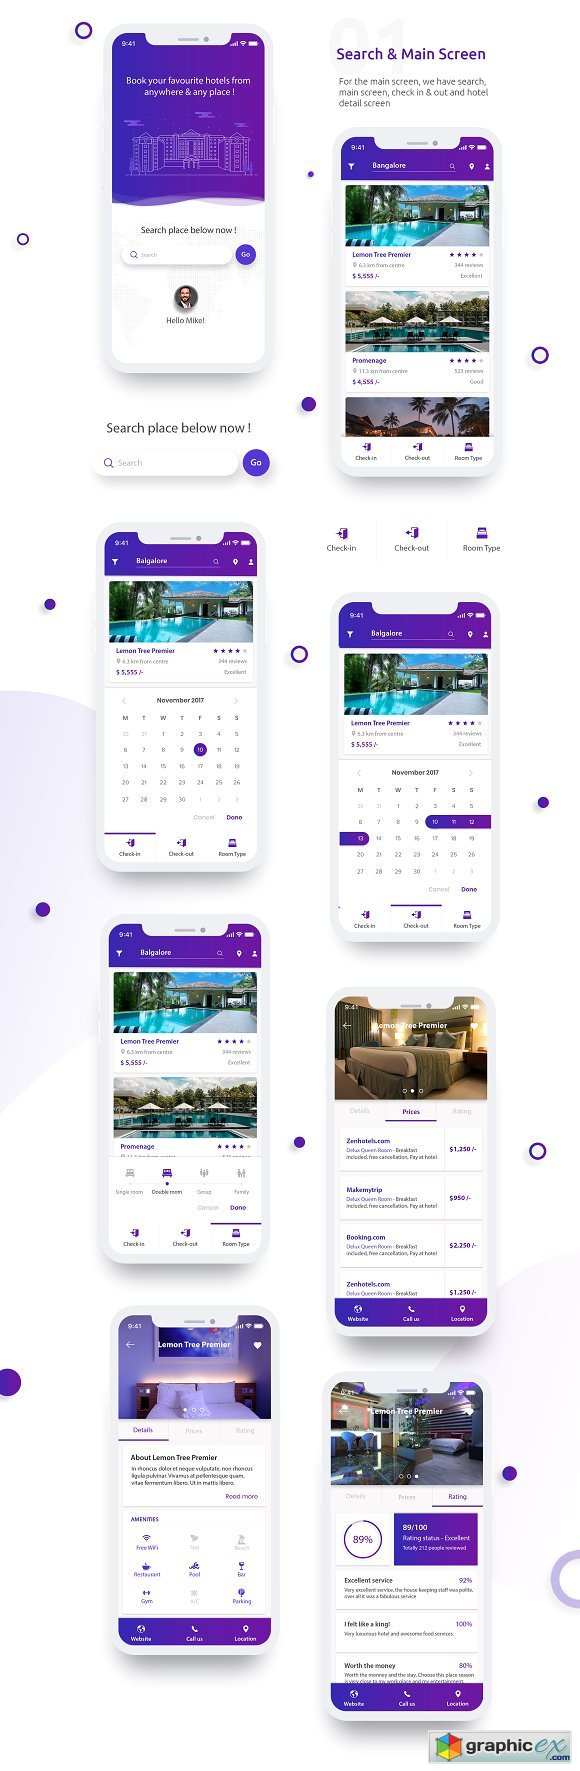 Complete UI Kit - Hotel Booking App